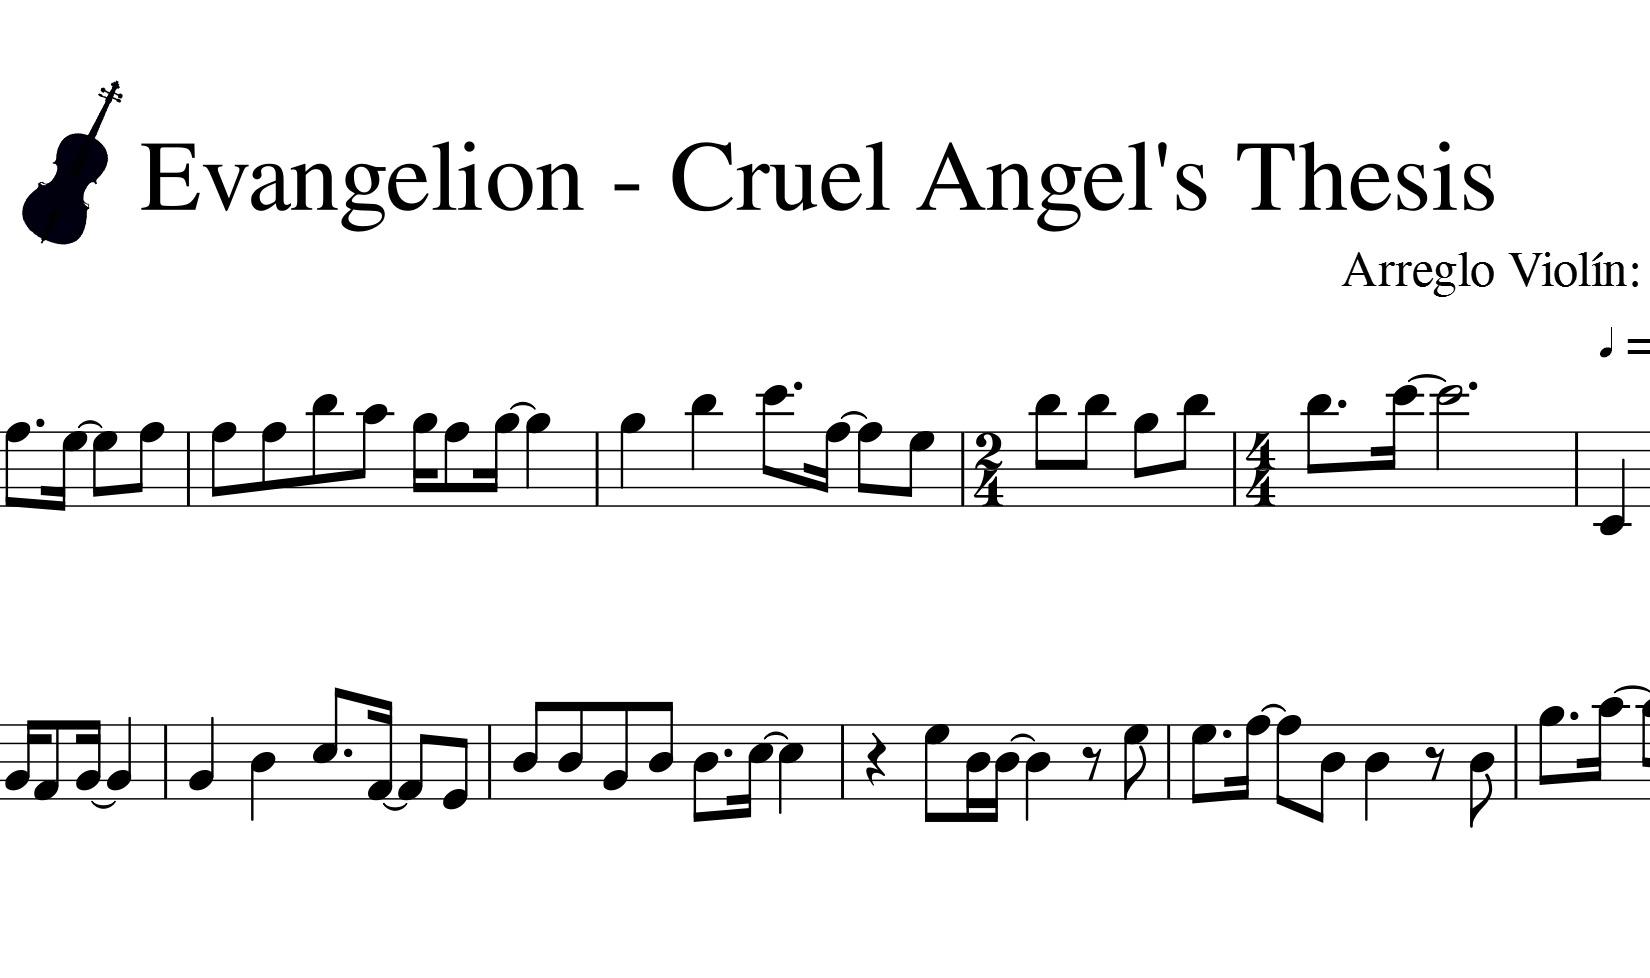 Evangelion - Cruel Angel's Thesis - Neon Genesis